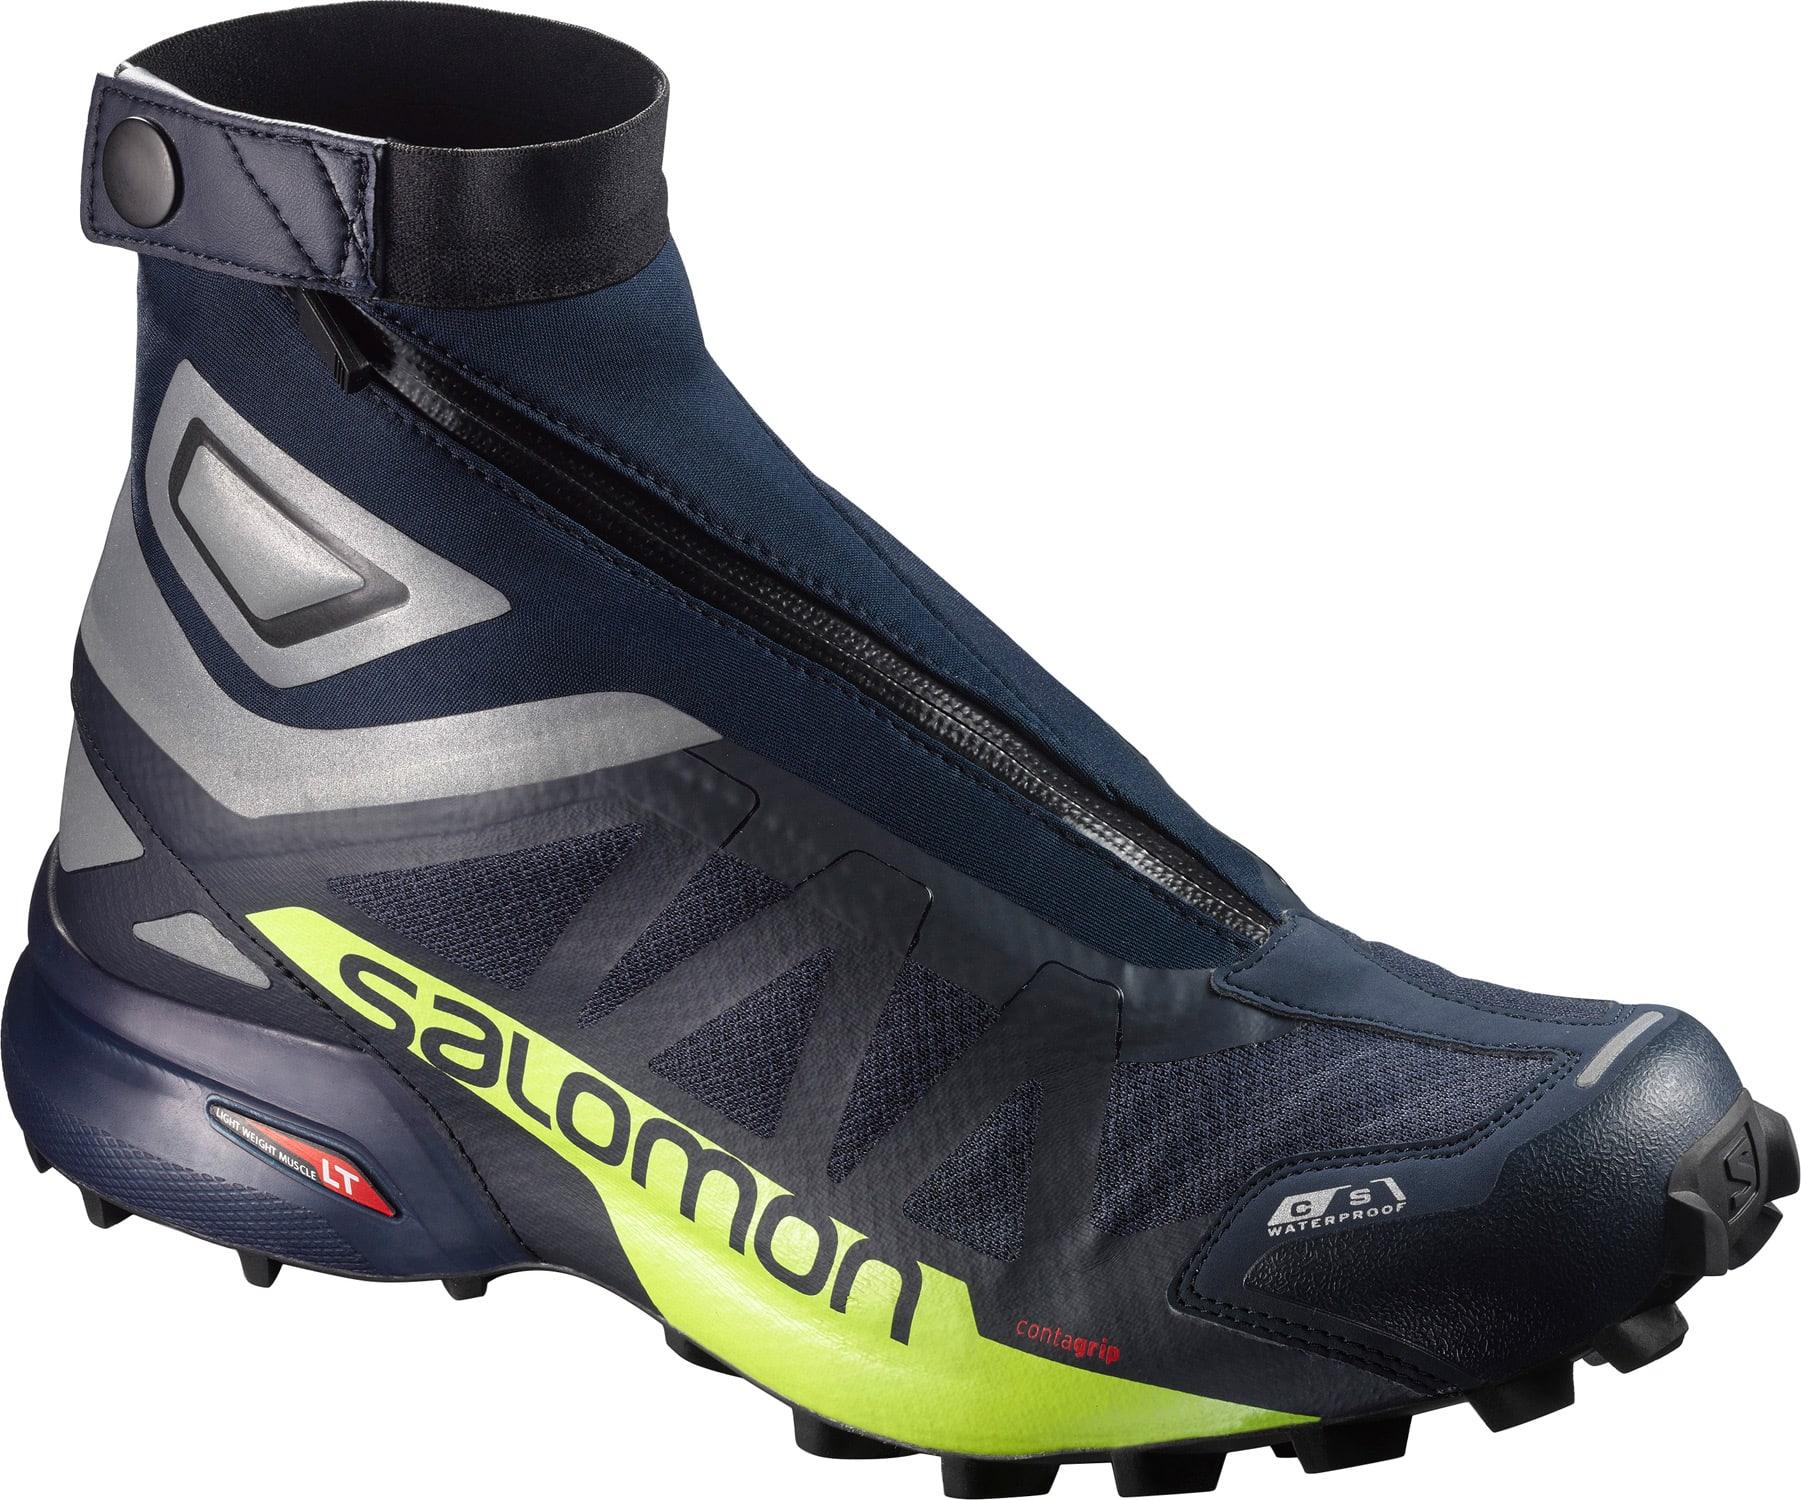 Salomon Snowcross 2 CSWP Trail Running